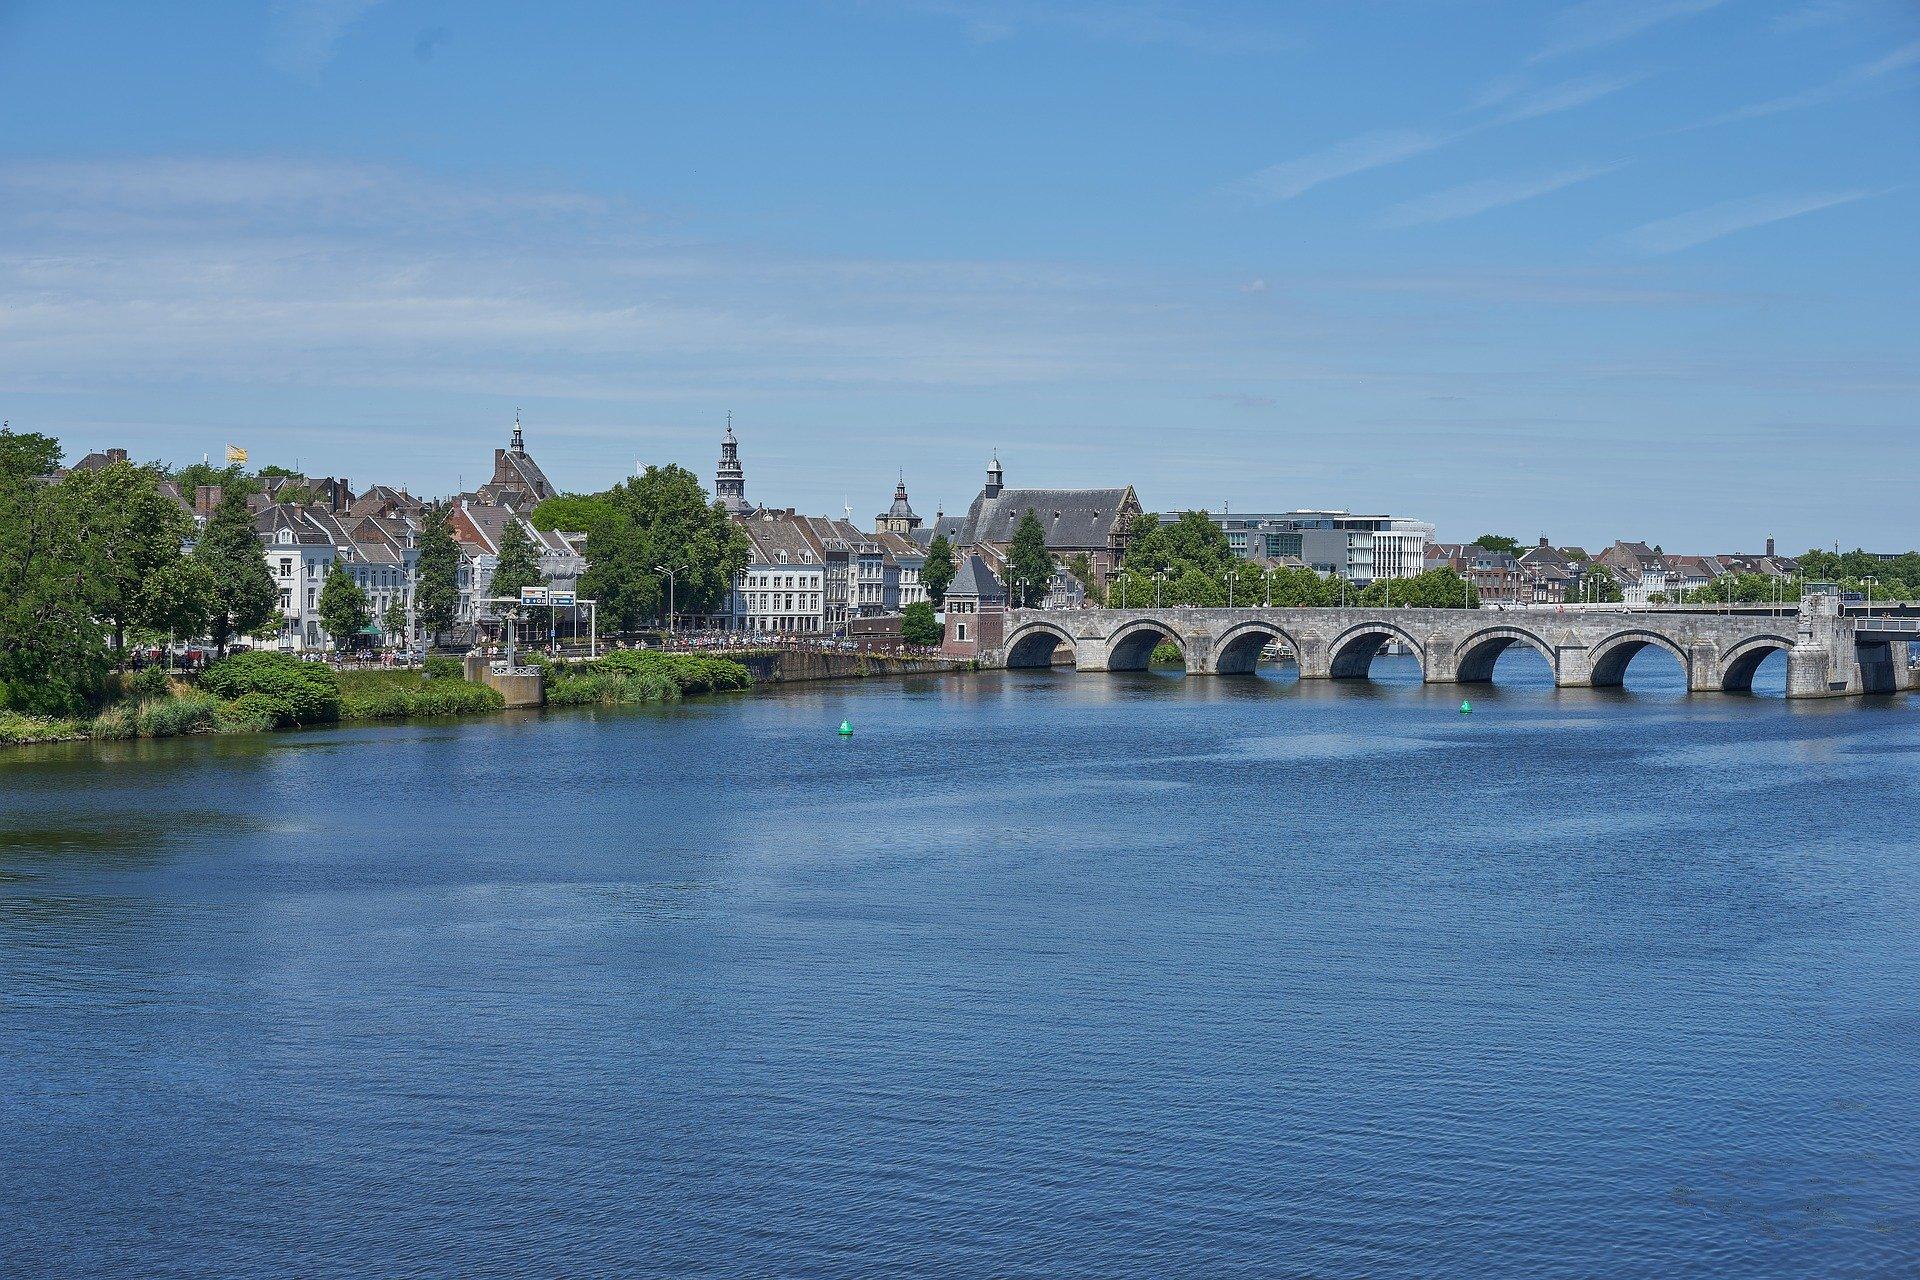 Stadswandeling Maastricht